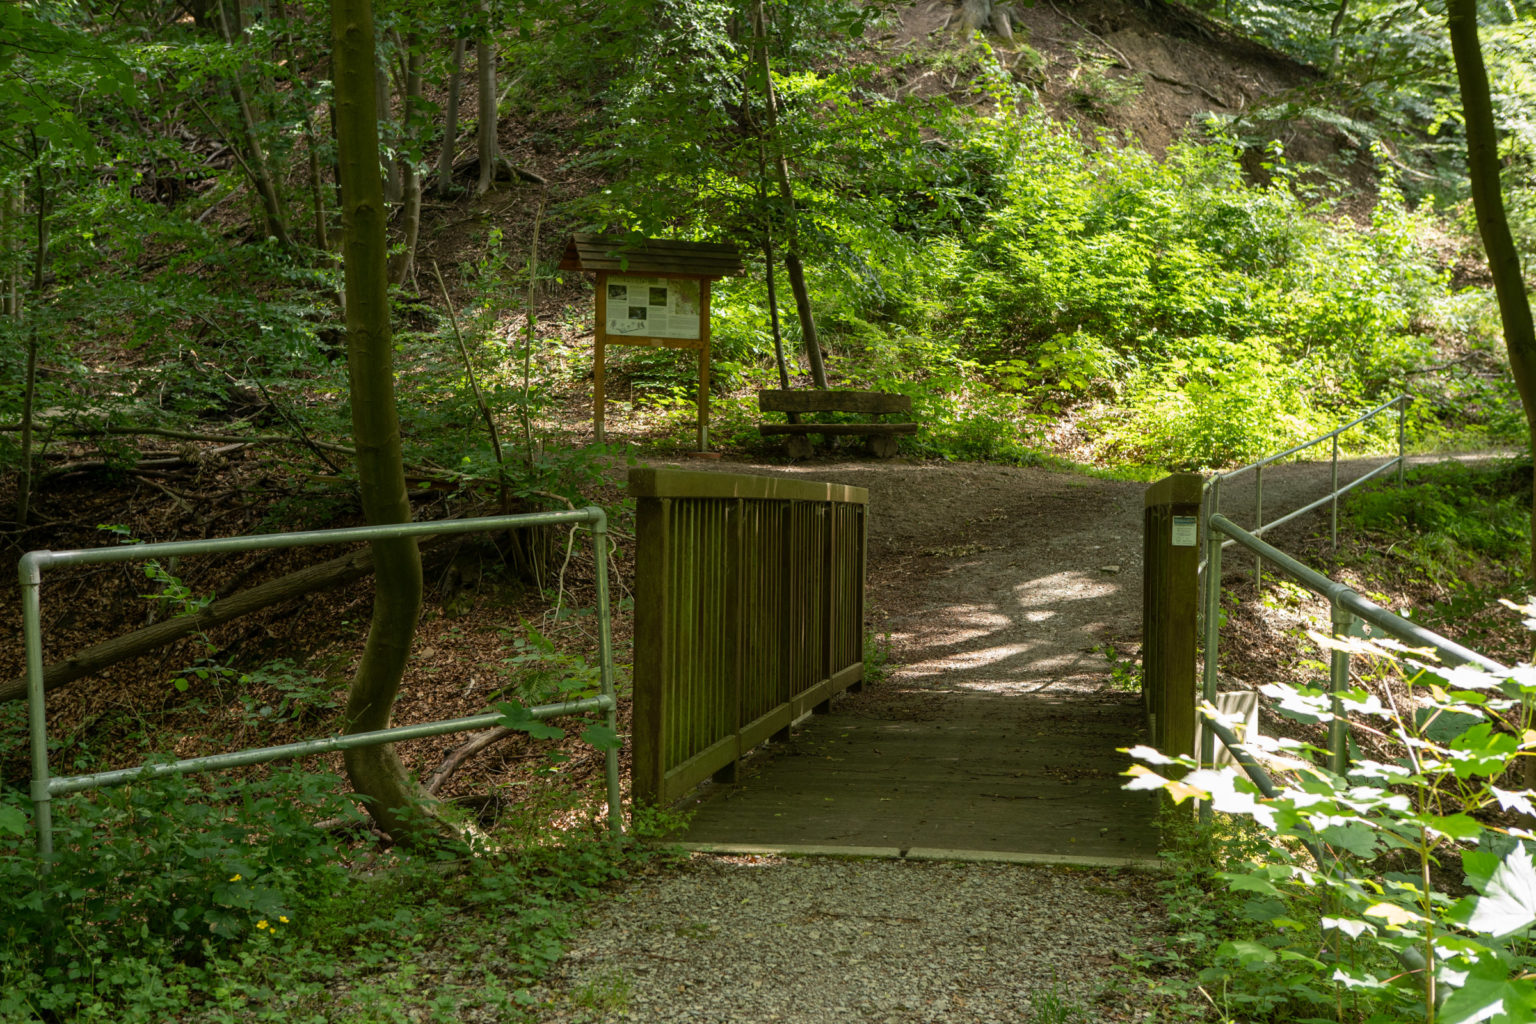 grenzlehrpfad-bad-helmstedt-11